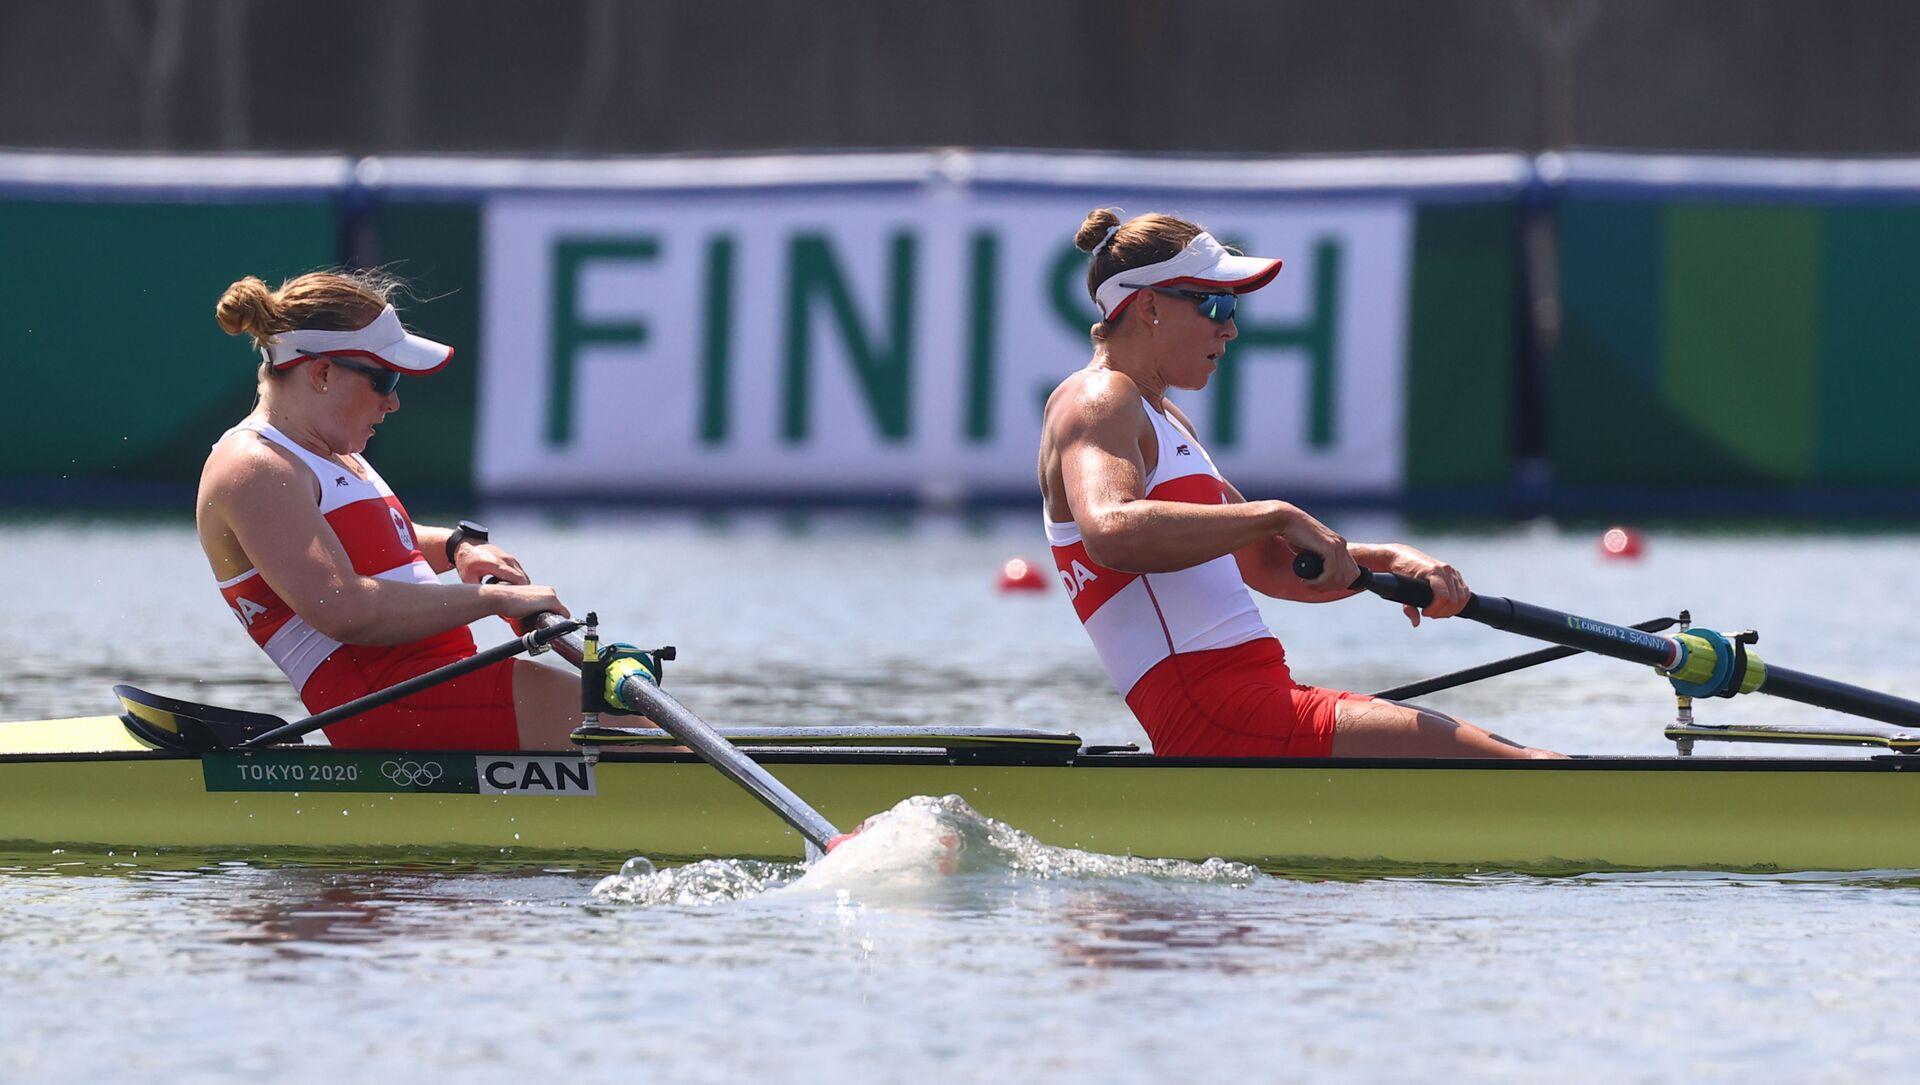 Tokyo 2020 Olympics - Rowing - Women's Pair - Heats - Sea Forest Waterway, Tokyo, Japan - July 24, 2021. - Sputnik International, 1920, 24.07.2021